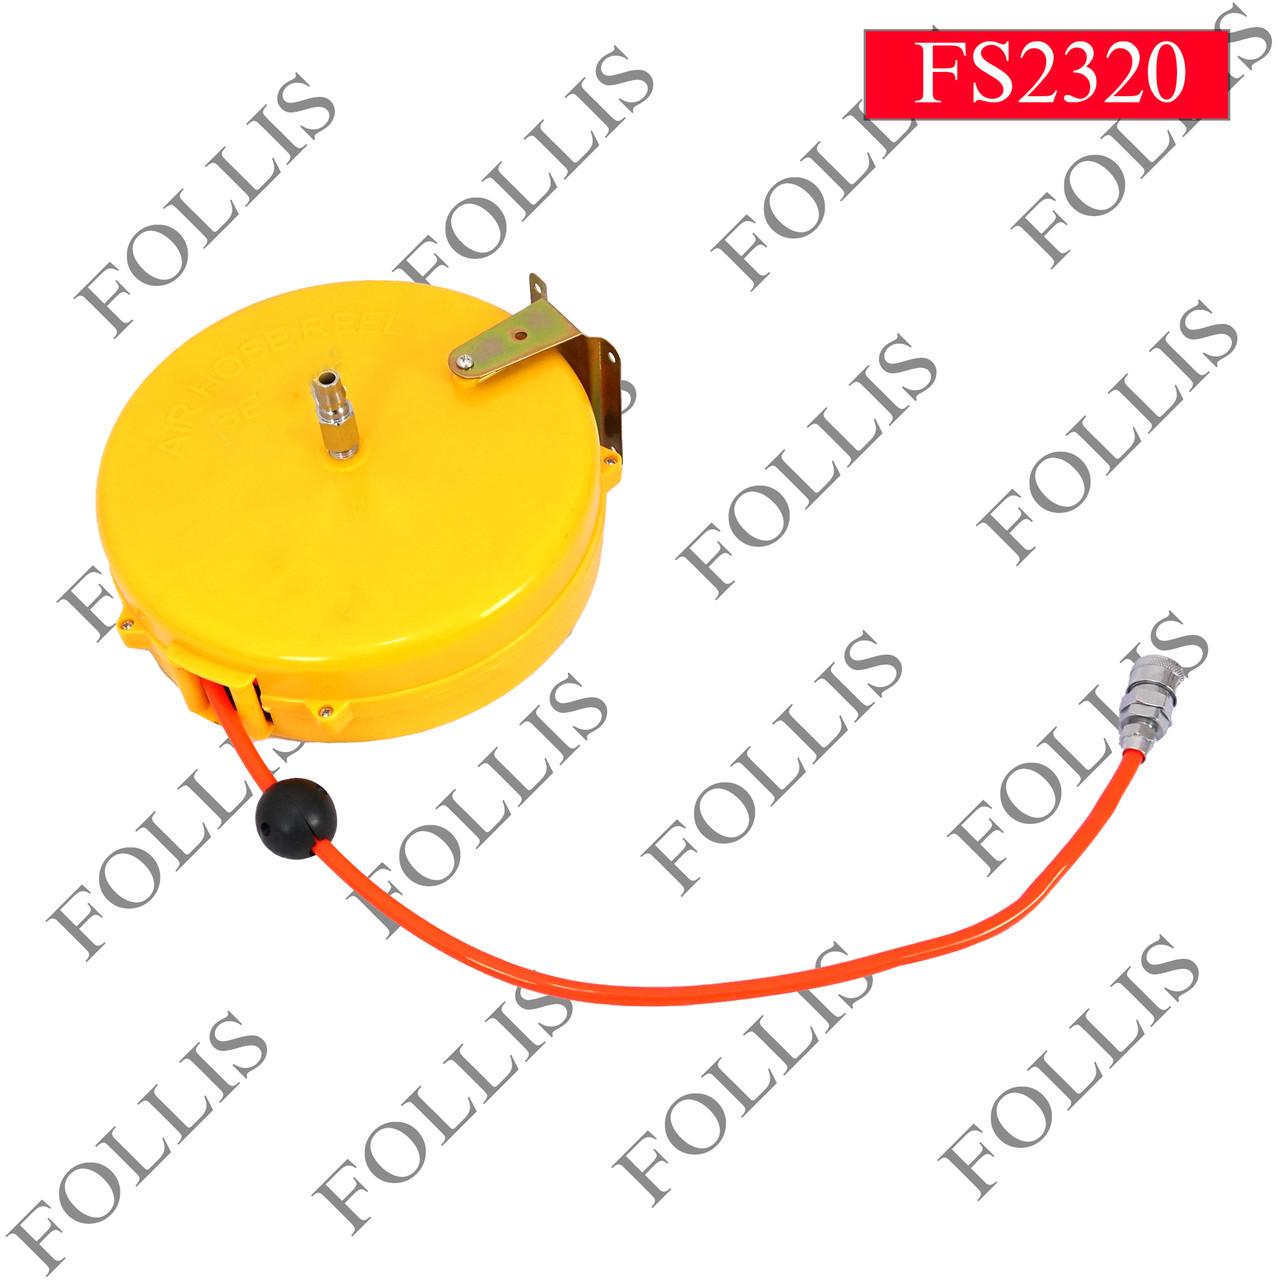 Удлин шланга возд желт NT-6006 8м